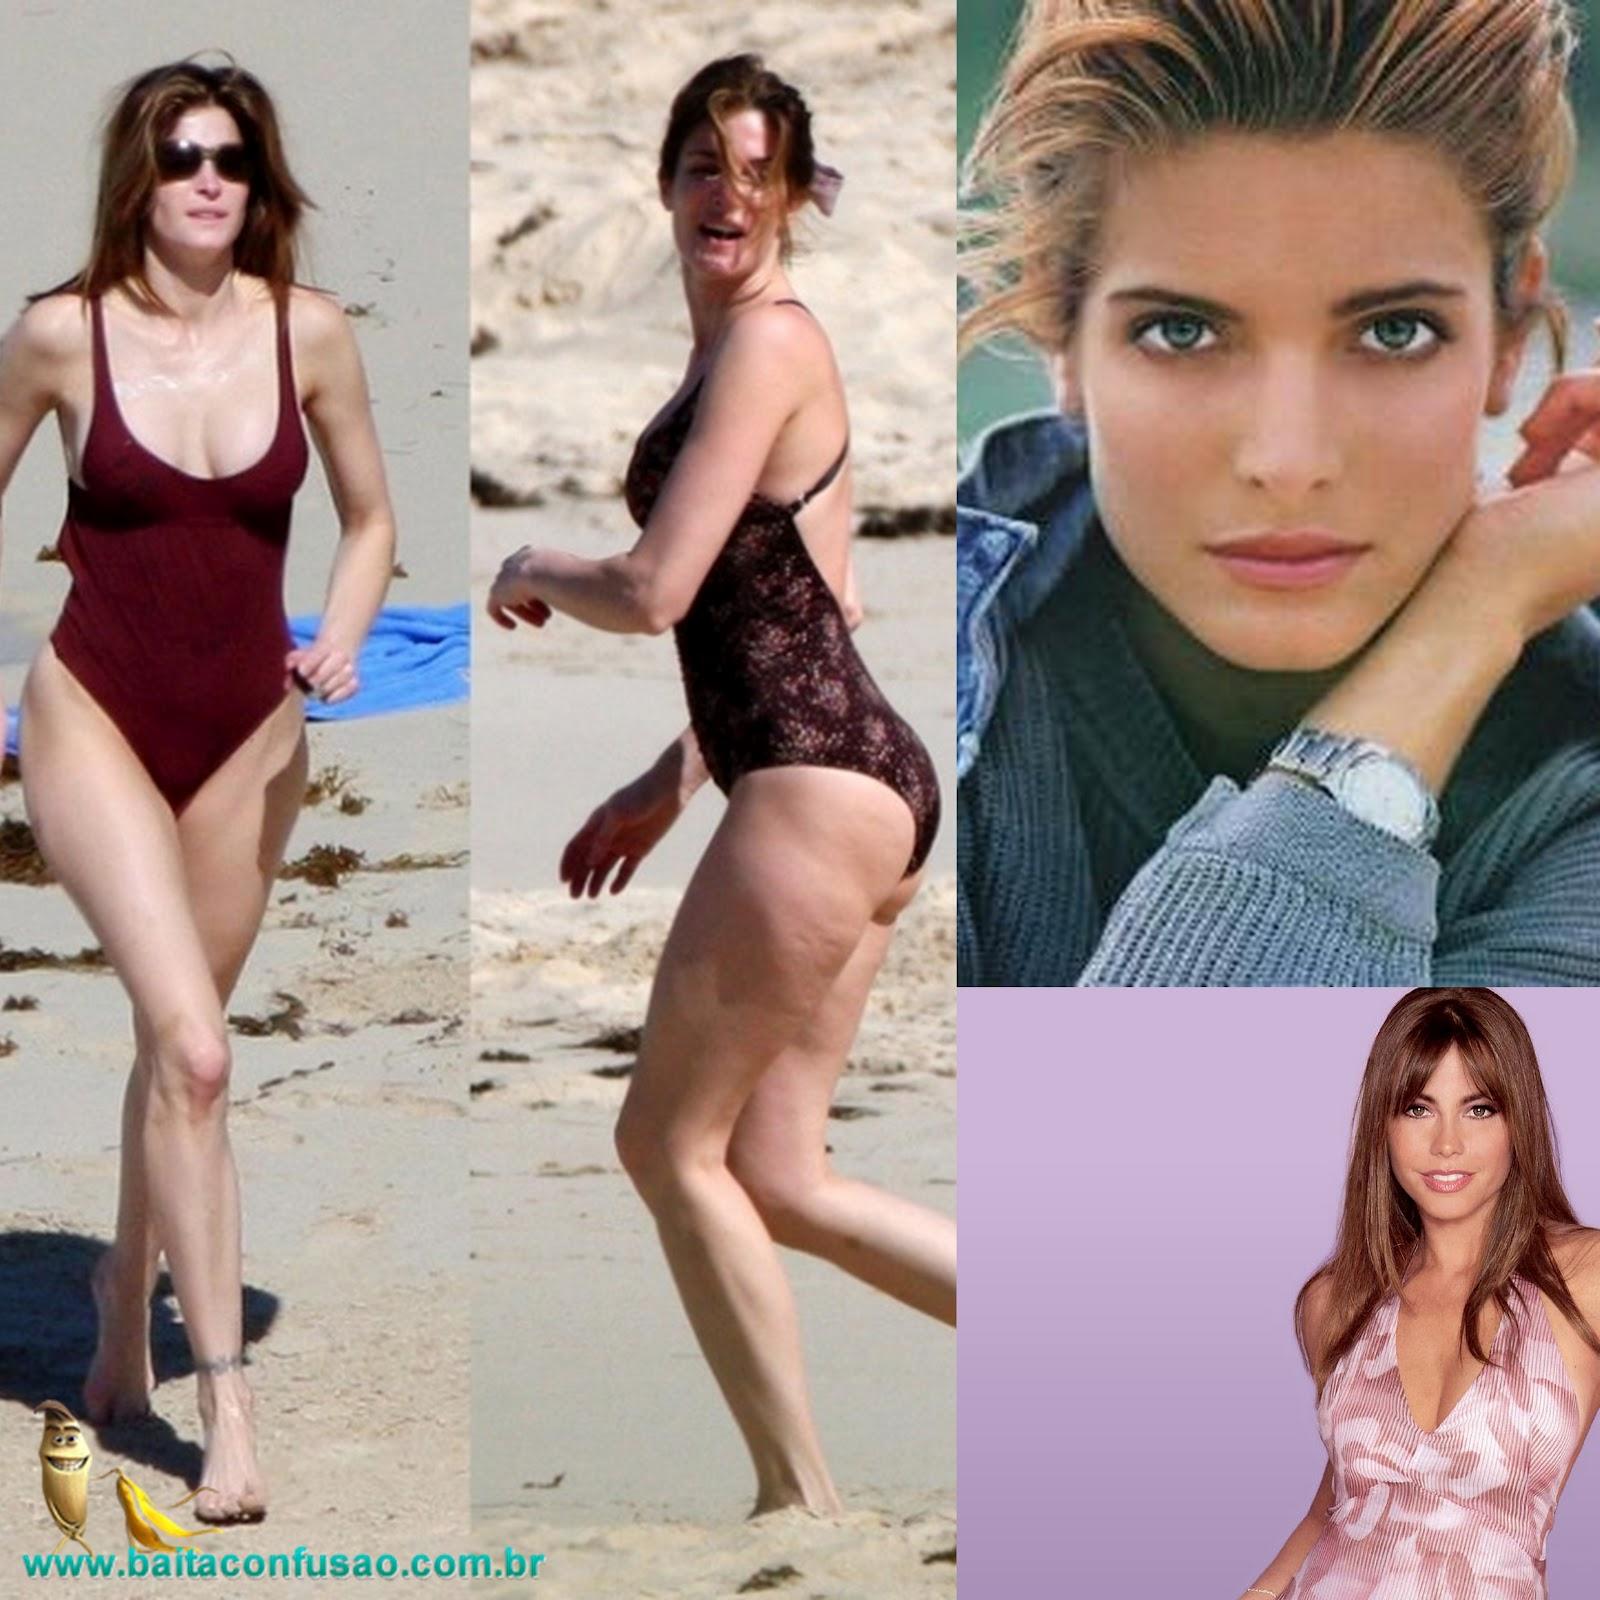 http://2.bp.blogspot.com/-191lKBSRayc/UALIm7mIkEI/AAAAAAAAByM/7IYCuq4s4rE/s1600/Stephanie+Seymour.jpg